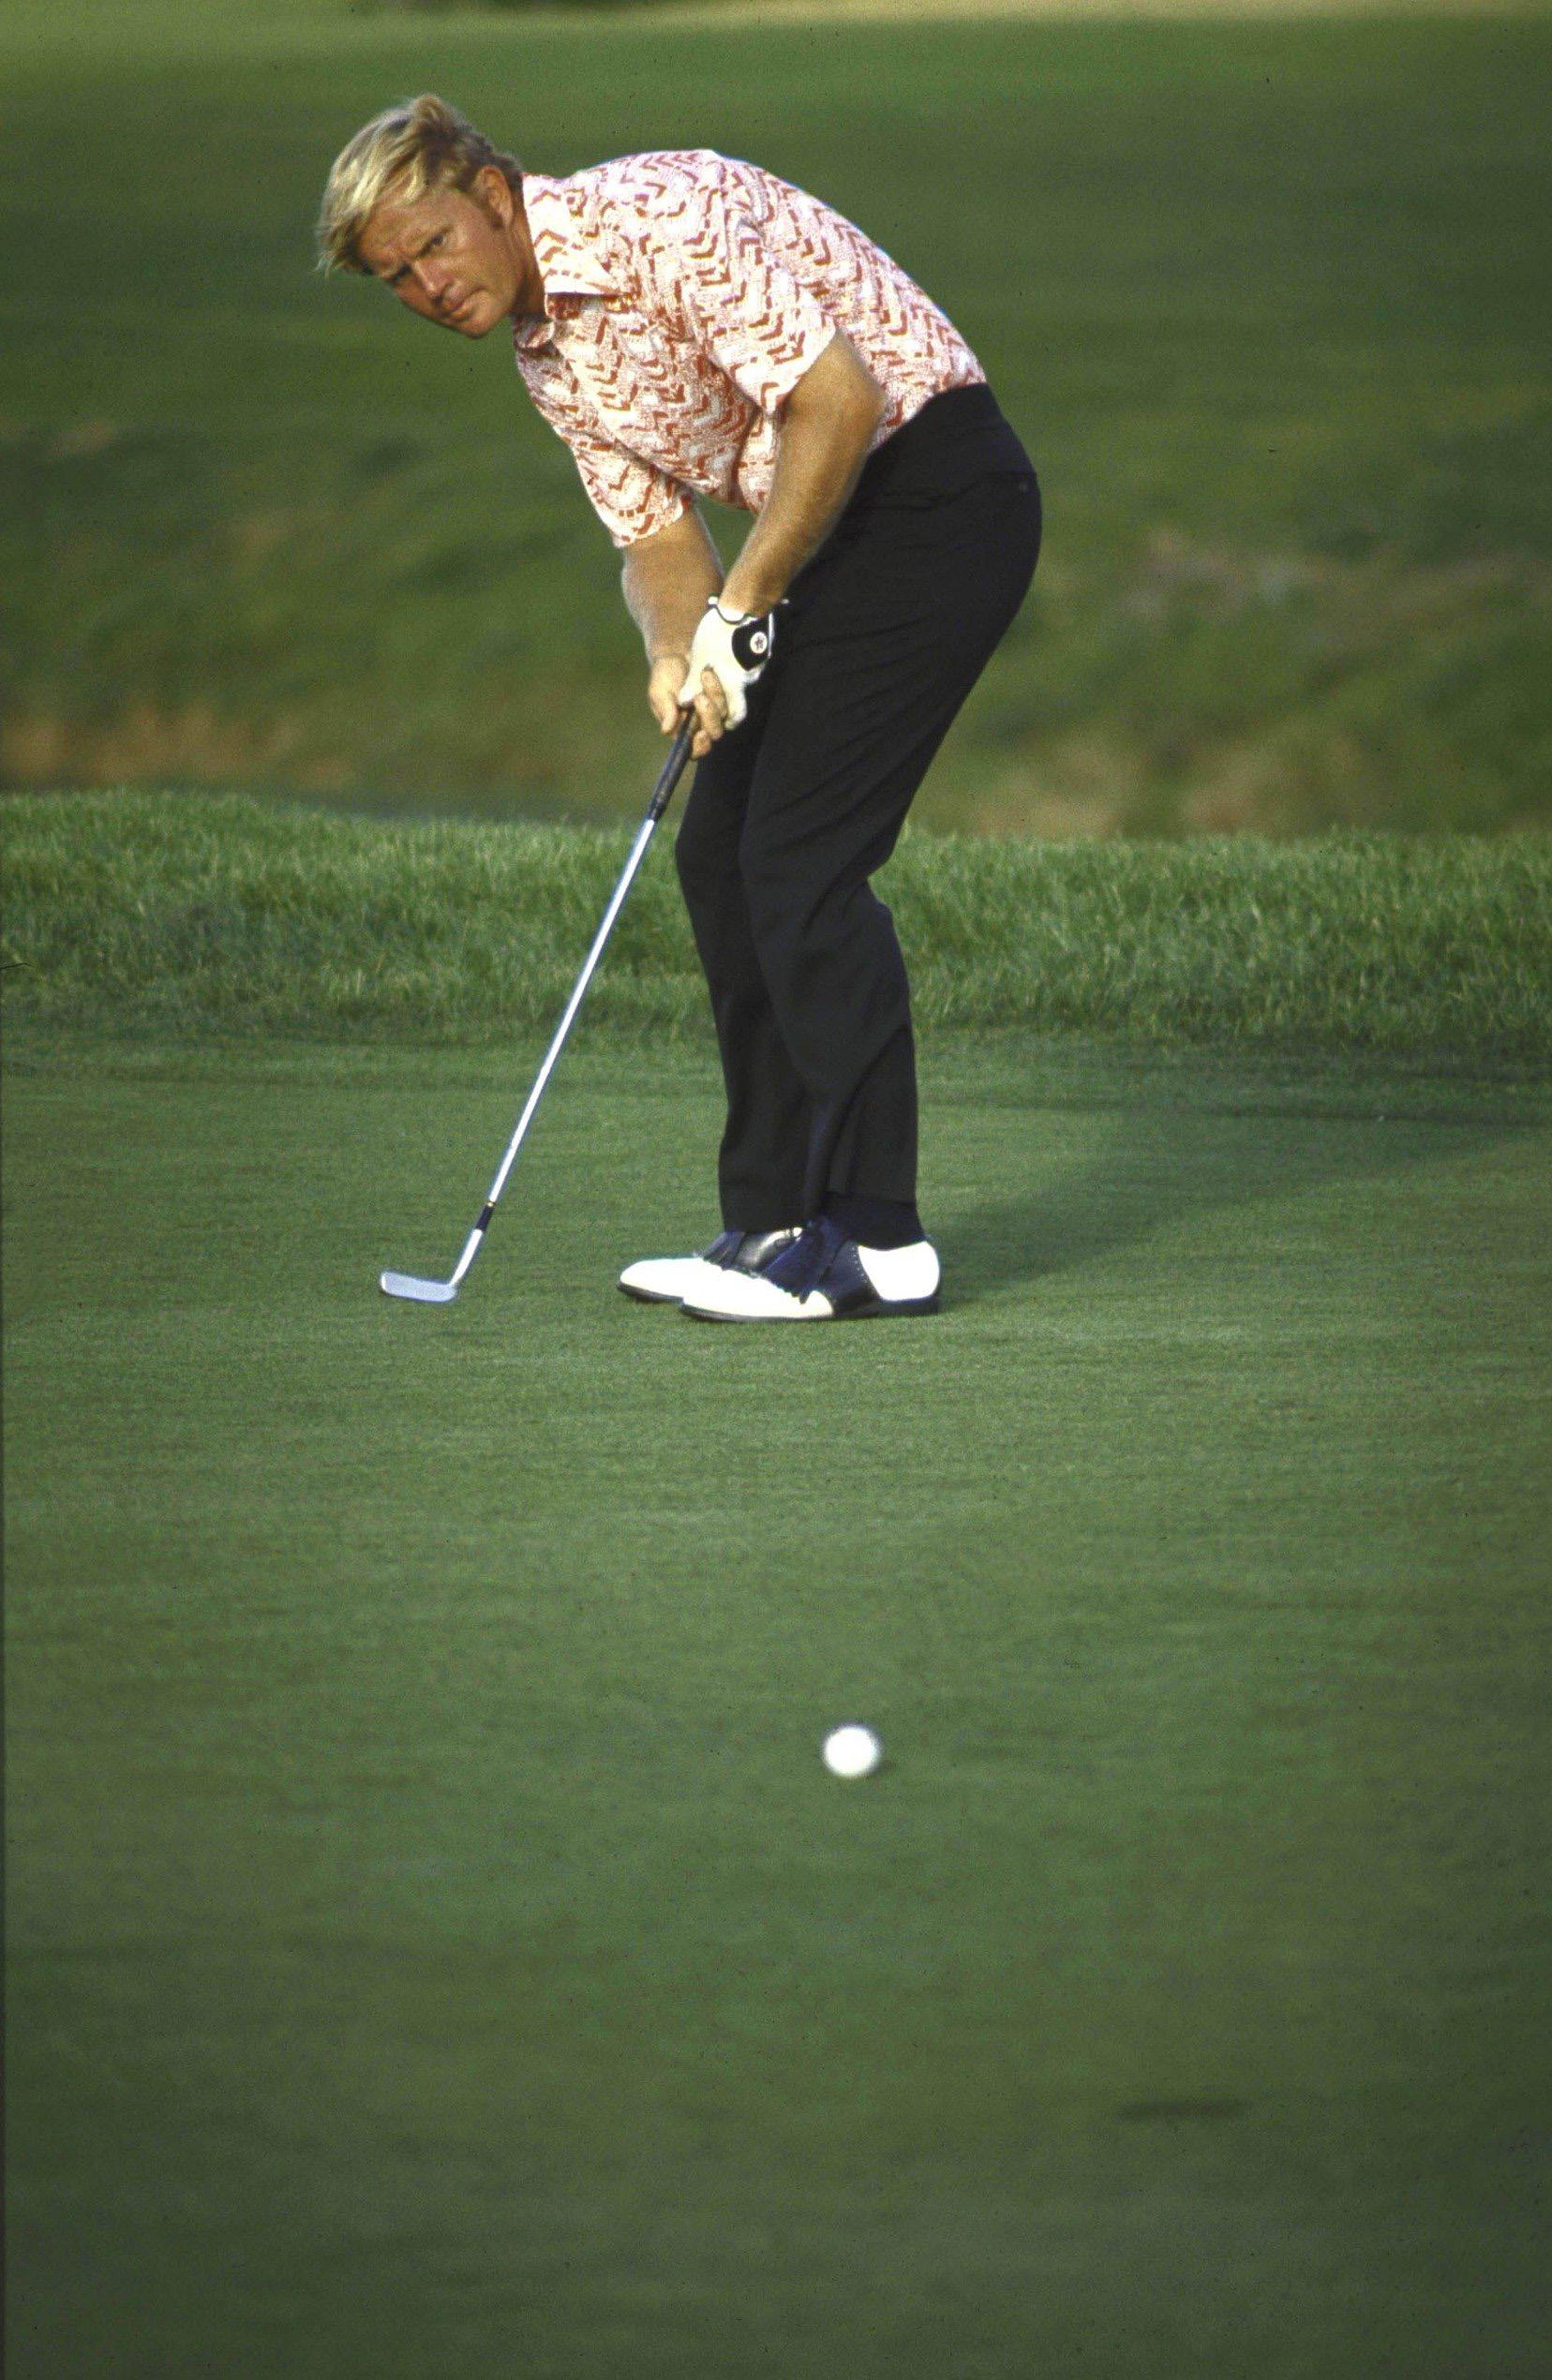 Jack Nicklaus at the 1971 PGA Championship at PGA National in Palm Beach Gardens, Fla.